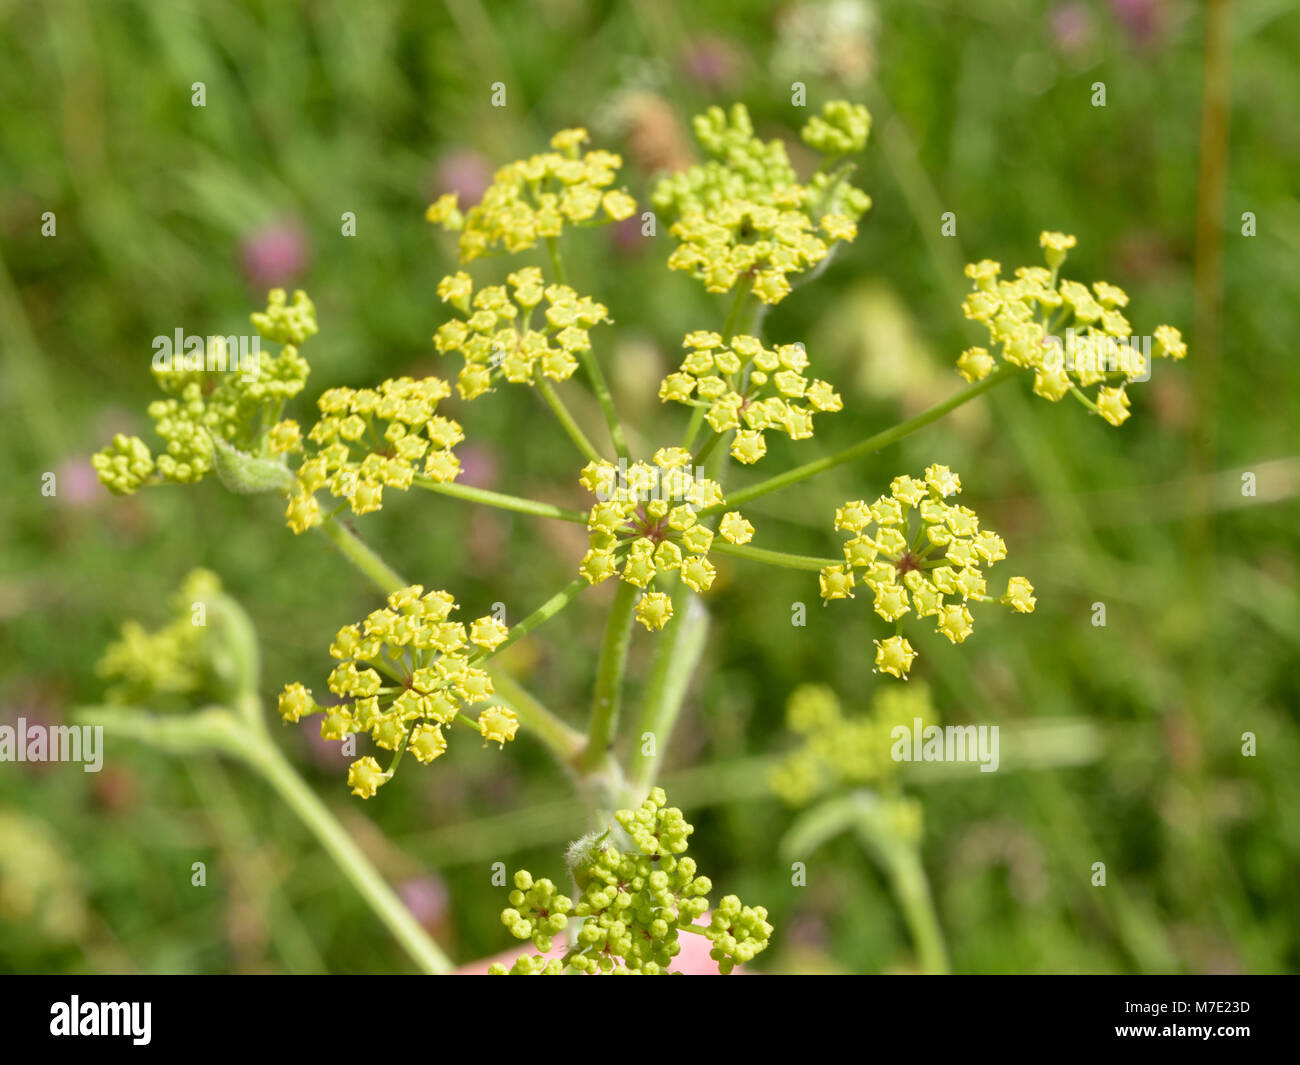 Wild Parsnip, Pastinaca sativa - Stock Image